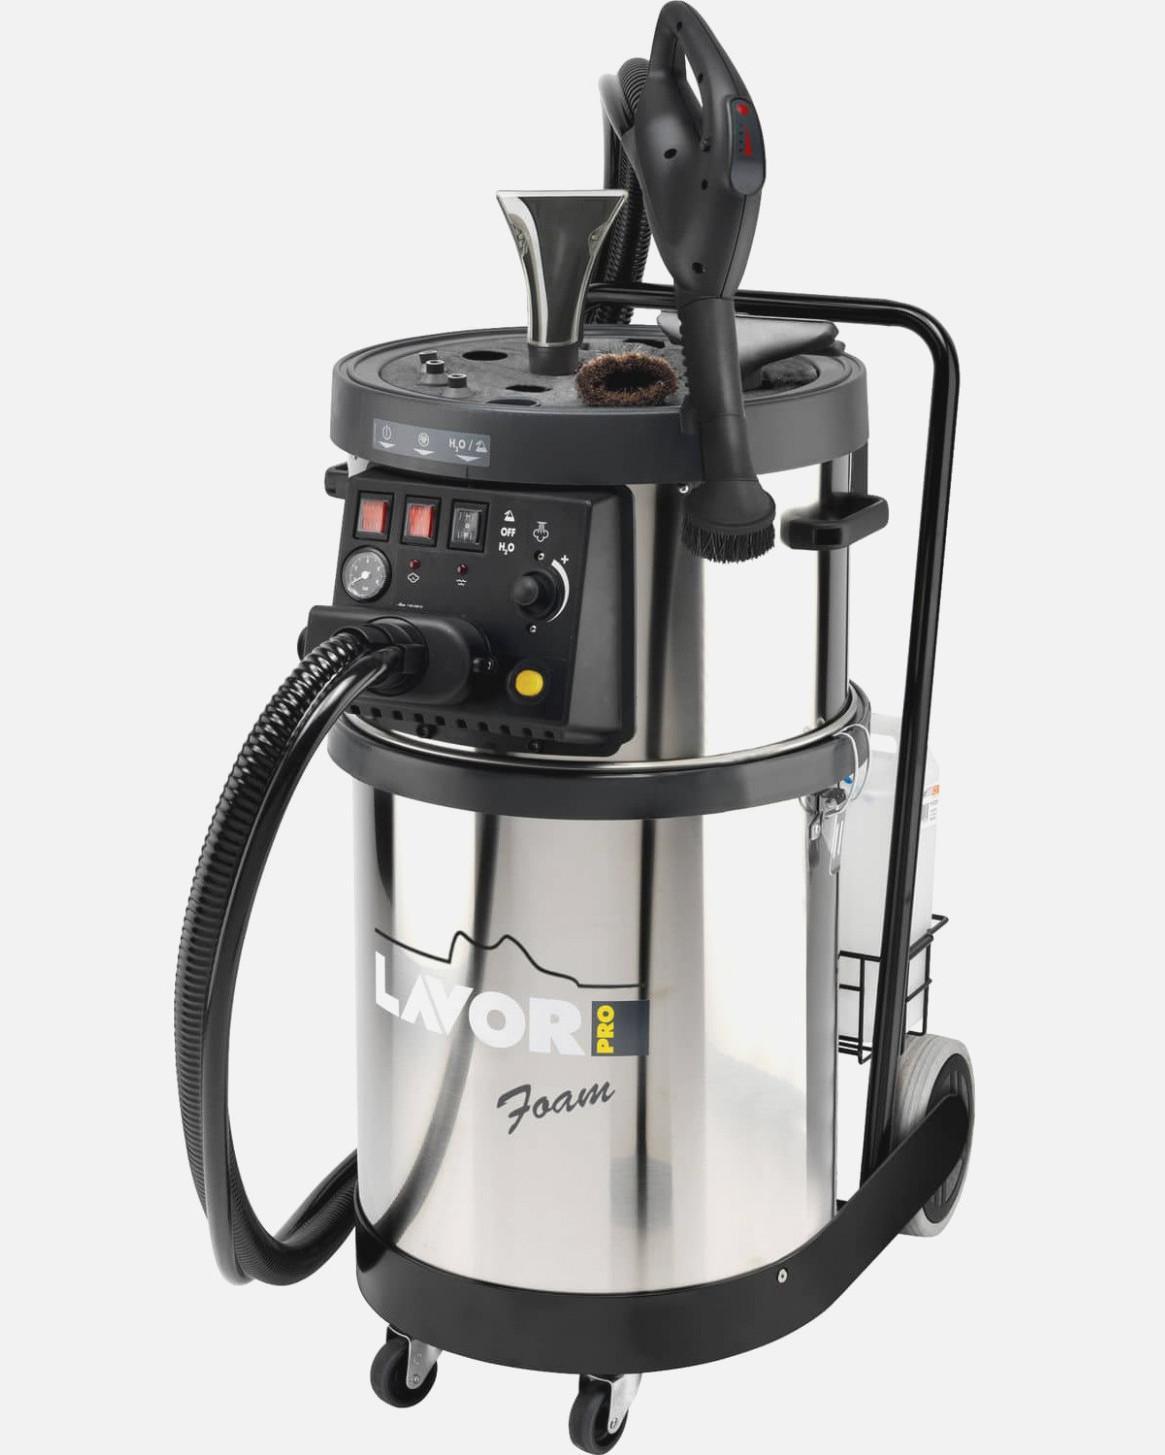 Парогенератор Lavor Pro gv etna 4.1 foam парогенератор lavor pro metis